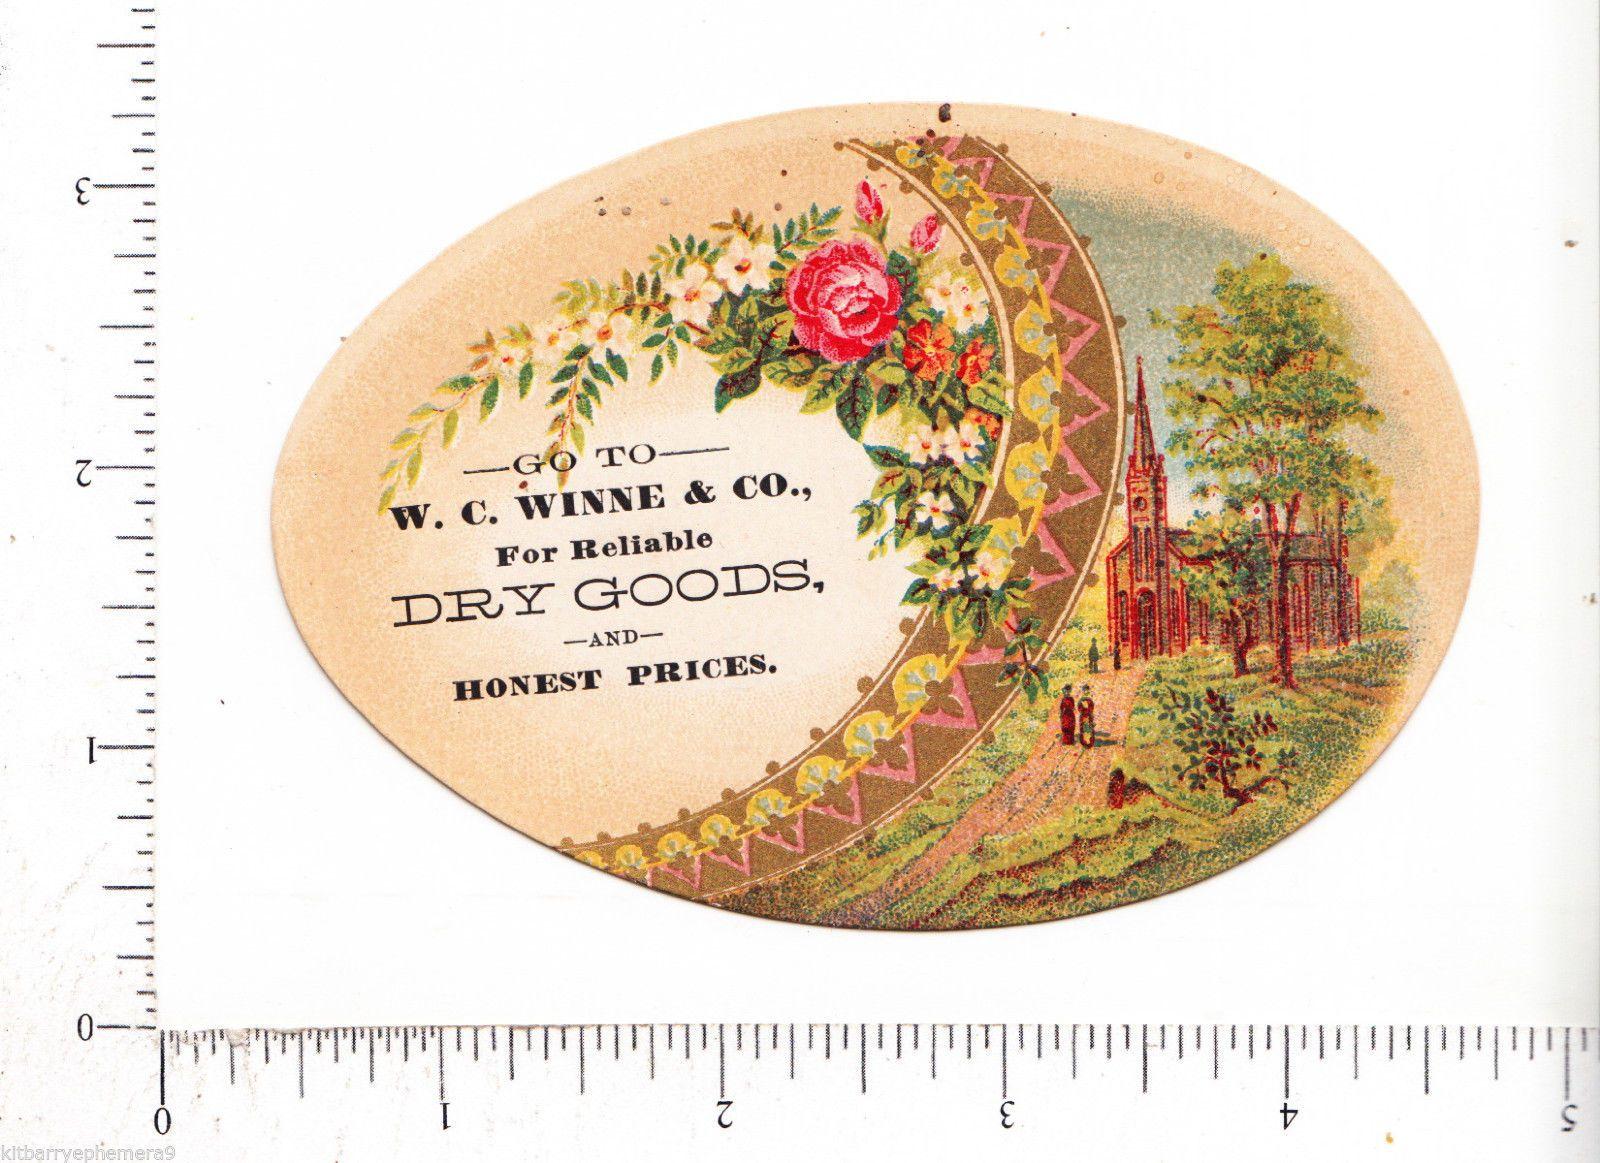 7168 w C Winne Die Cut Decorated Egg Advertising Trade Card Troy NY Dry Goods | eBay